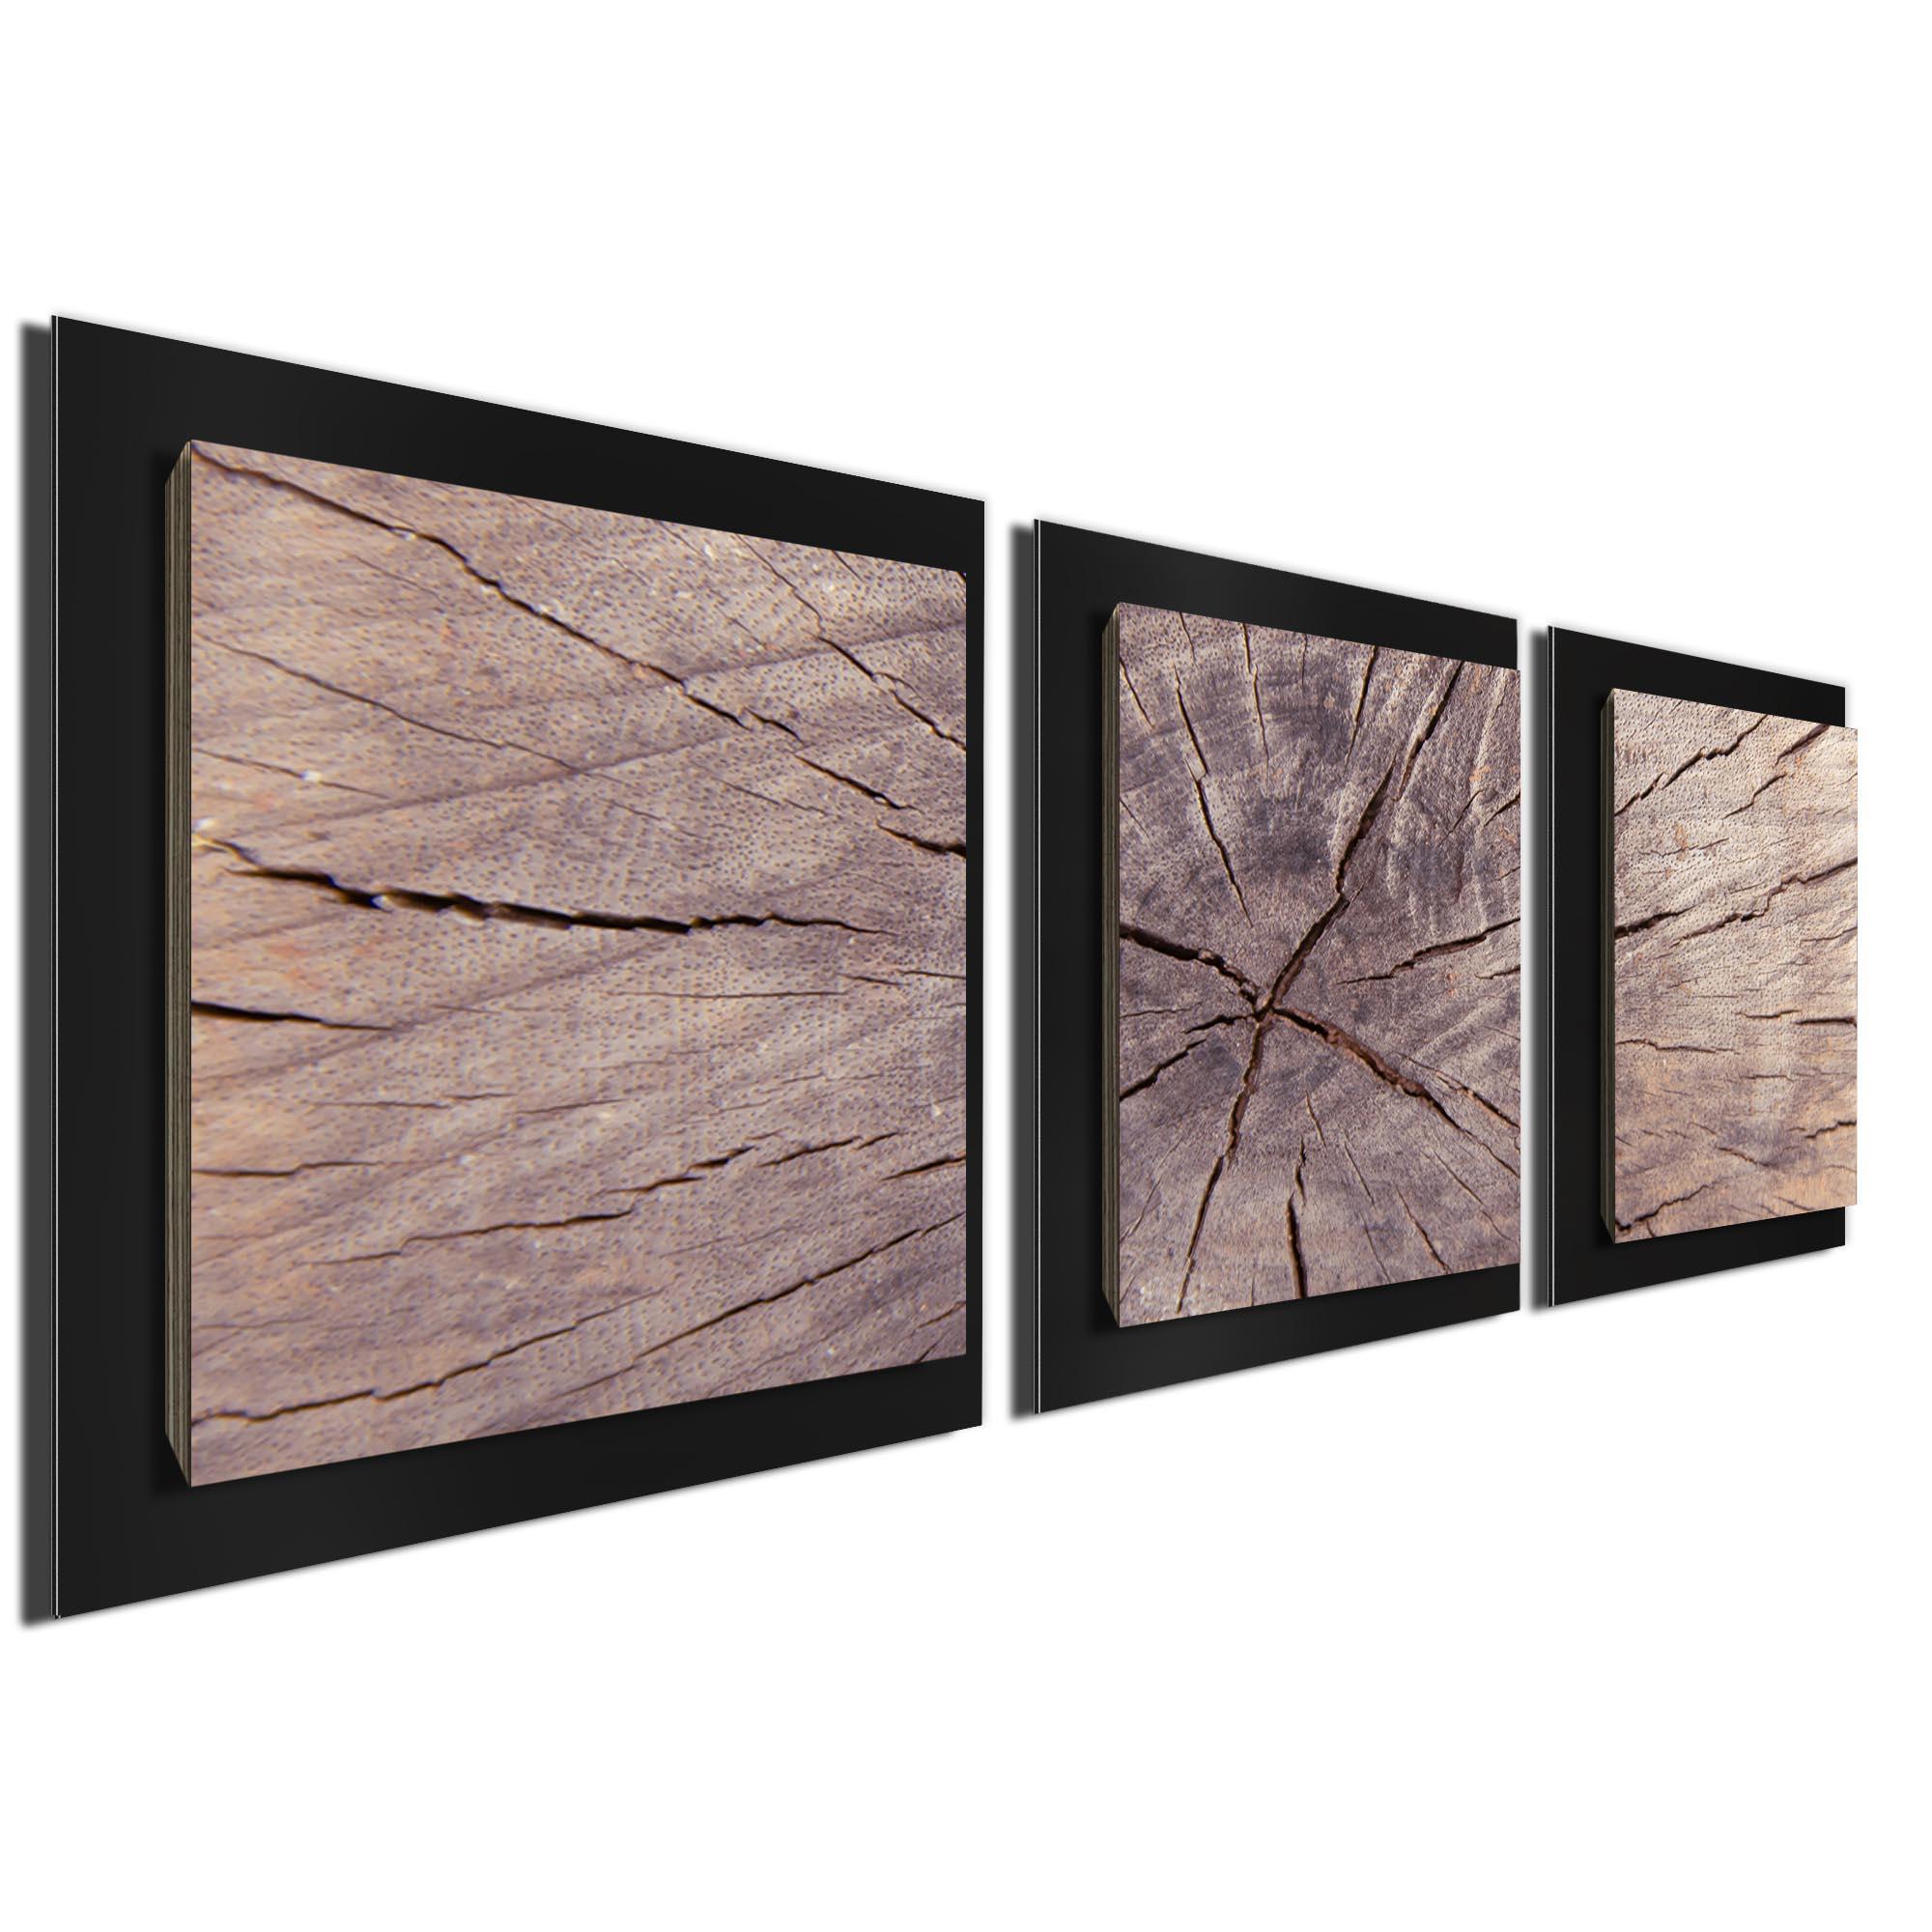 Cracked Wood Essence Black by Adam Schwoeppe Rustic Modern Style Wood Wall Art - Image 2